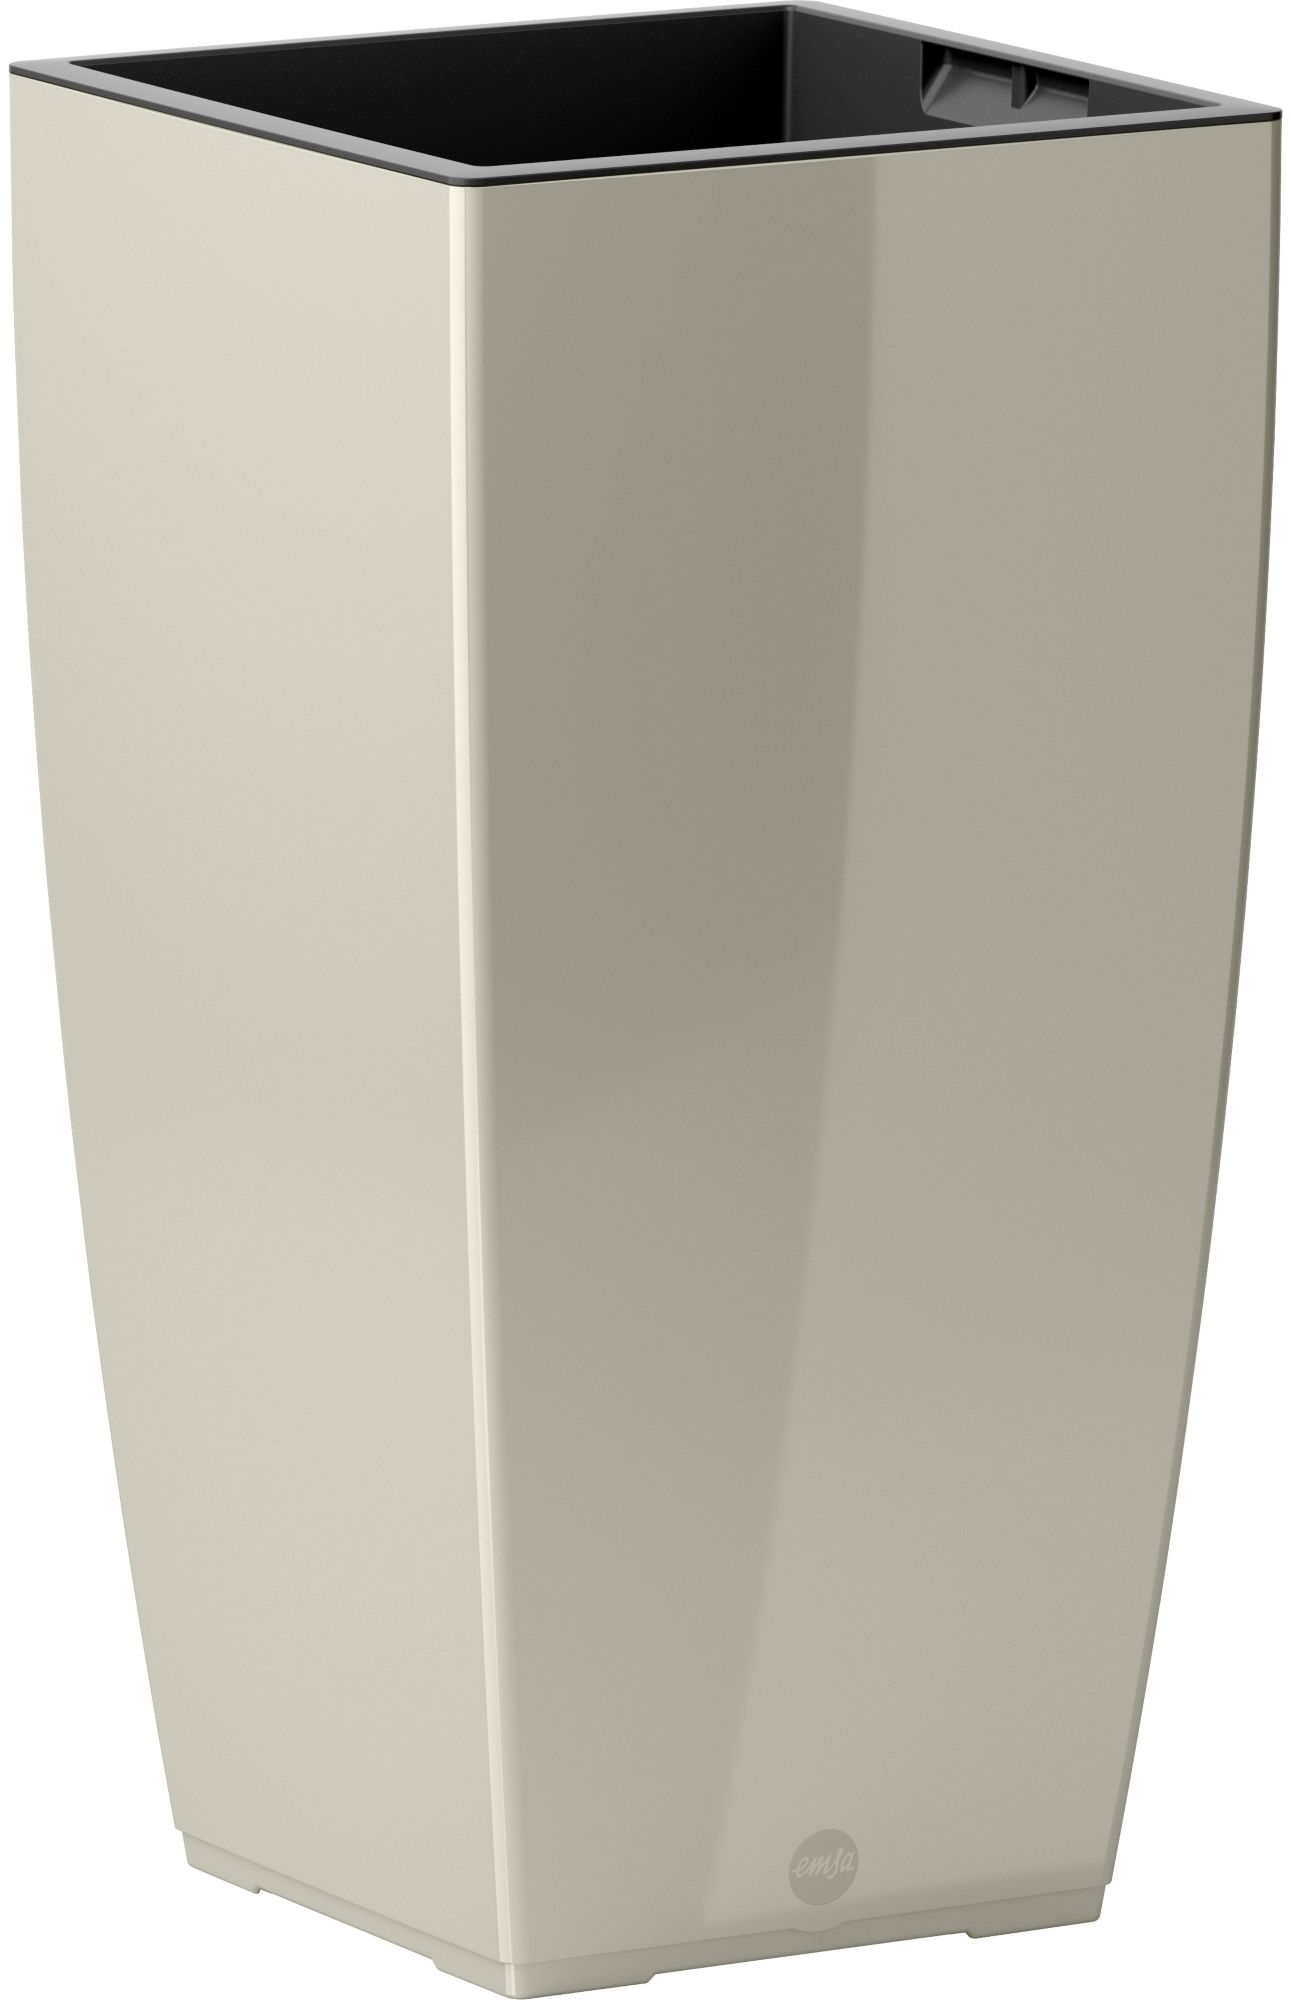 EMSA Blumenkasten »CASA Brilliant Säule«, BxTxH: 30x30x57 cm, grau